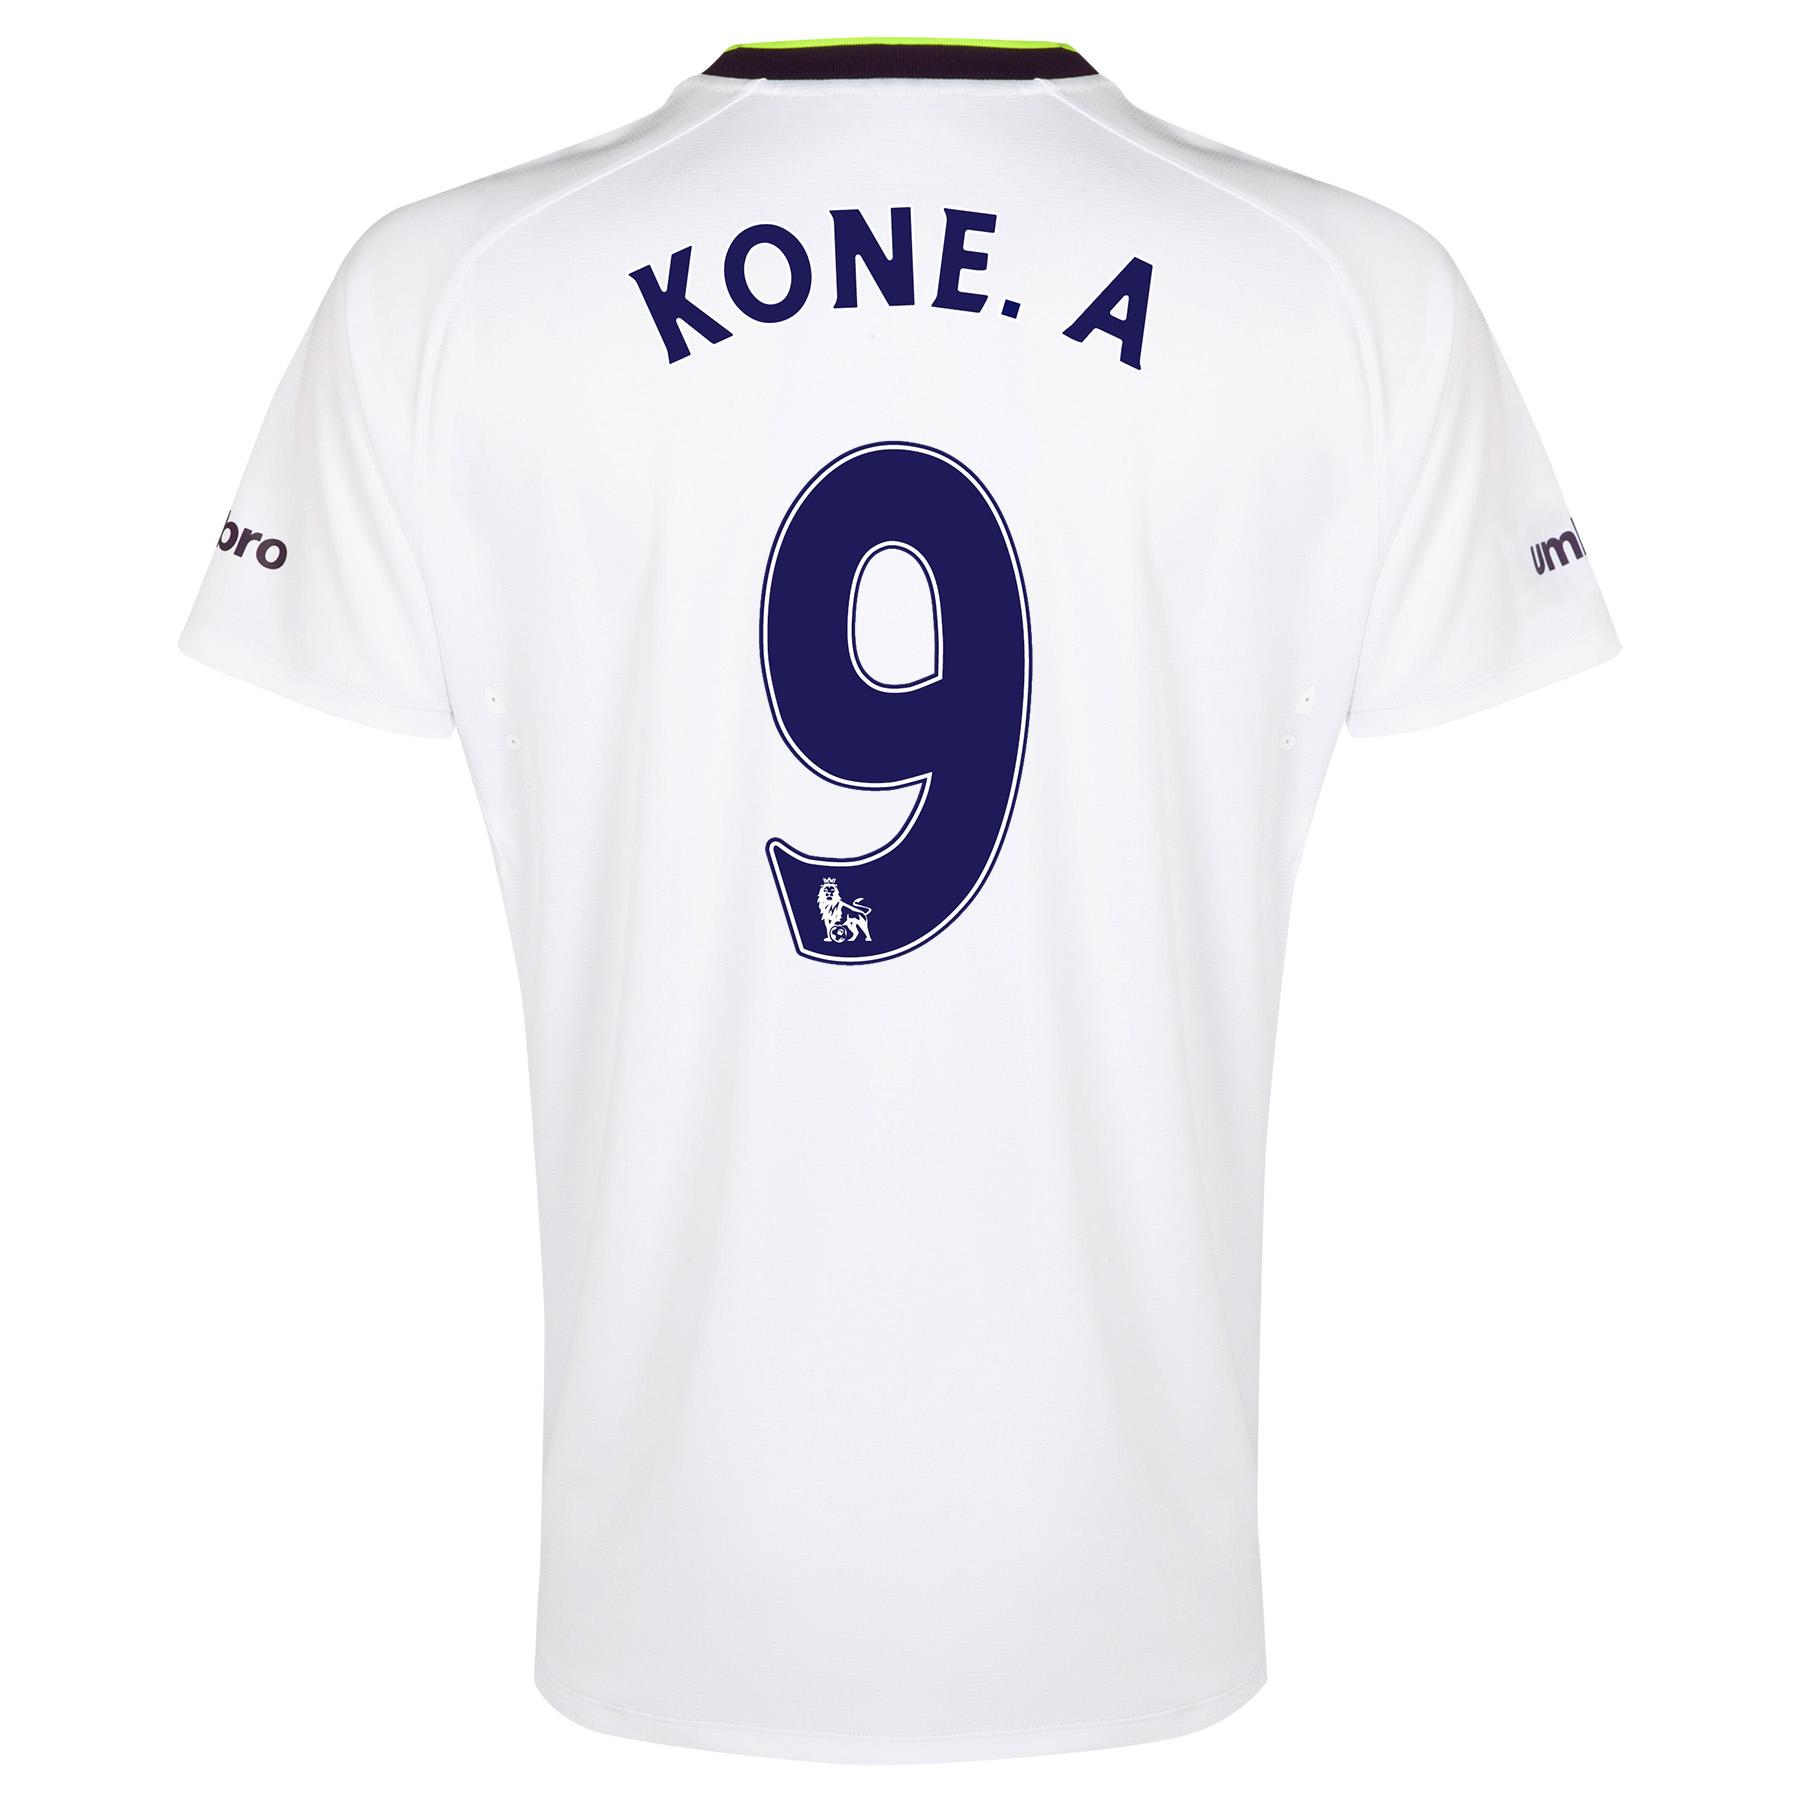 Everton SS 3rd Shirt  2014/15 with Kone.A 9 printing